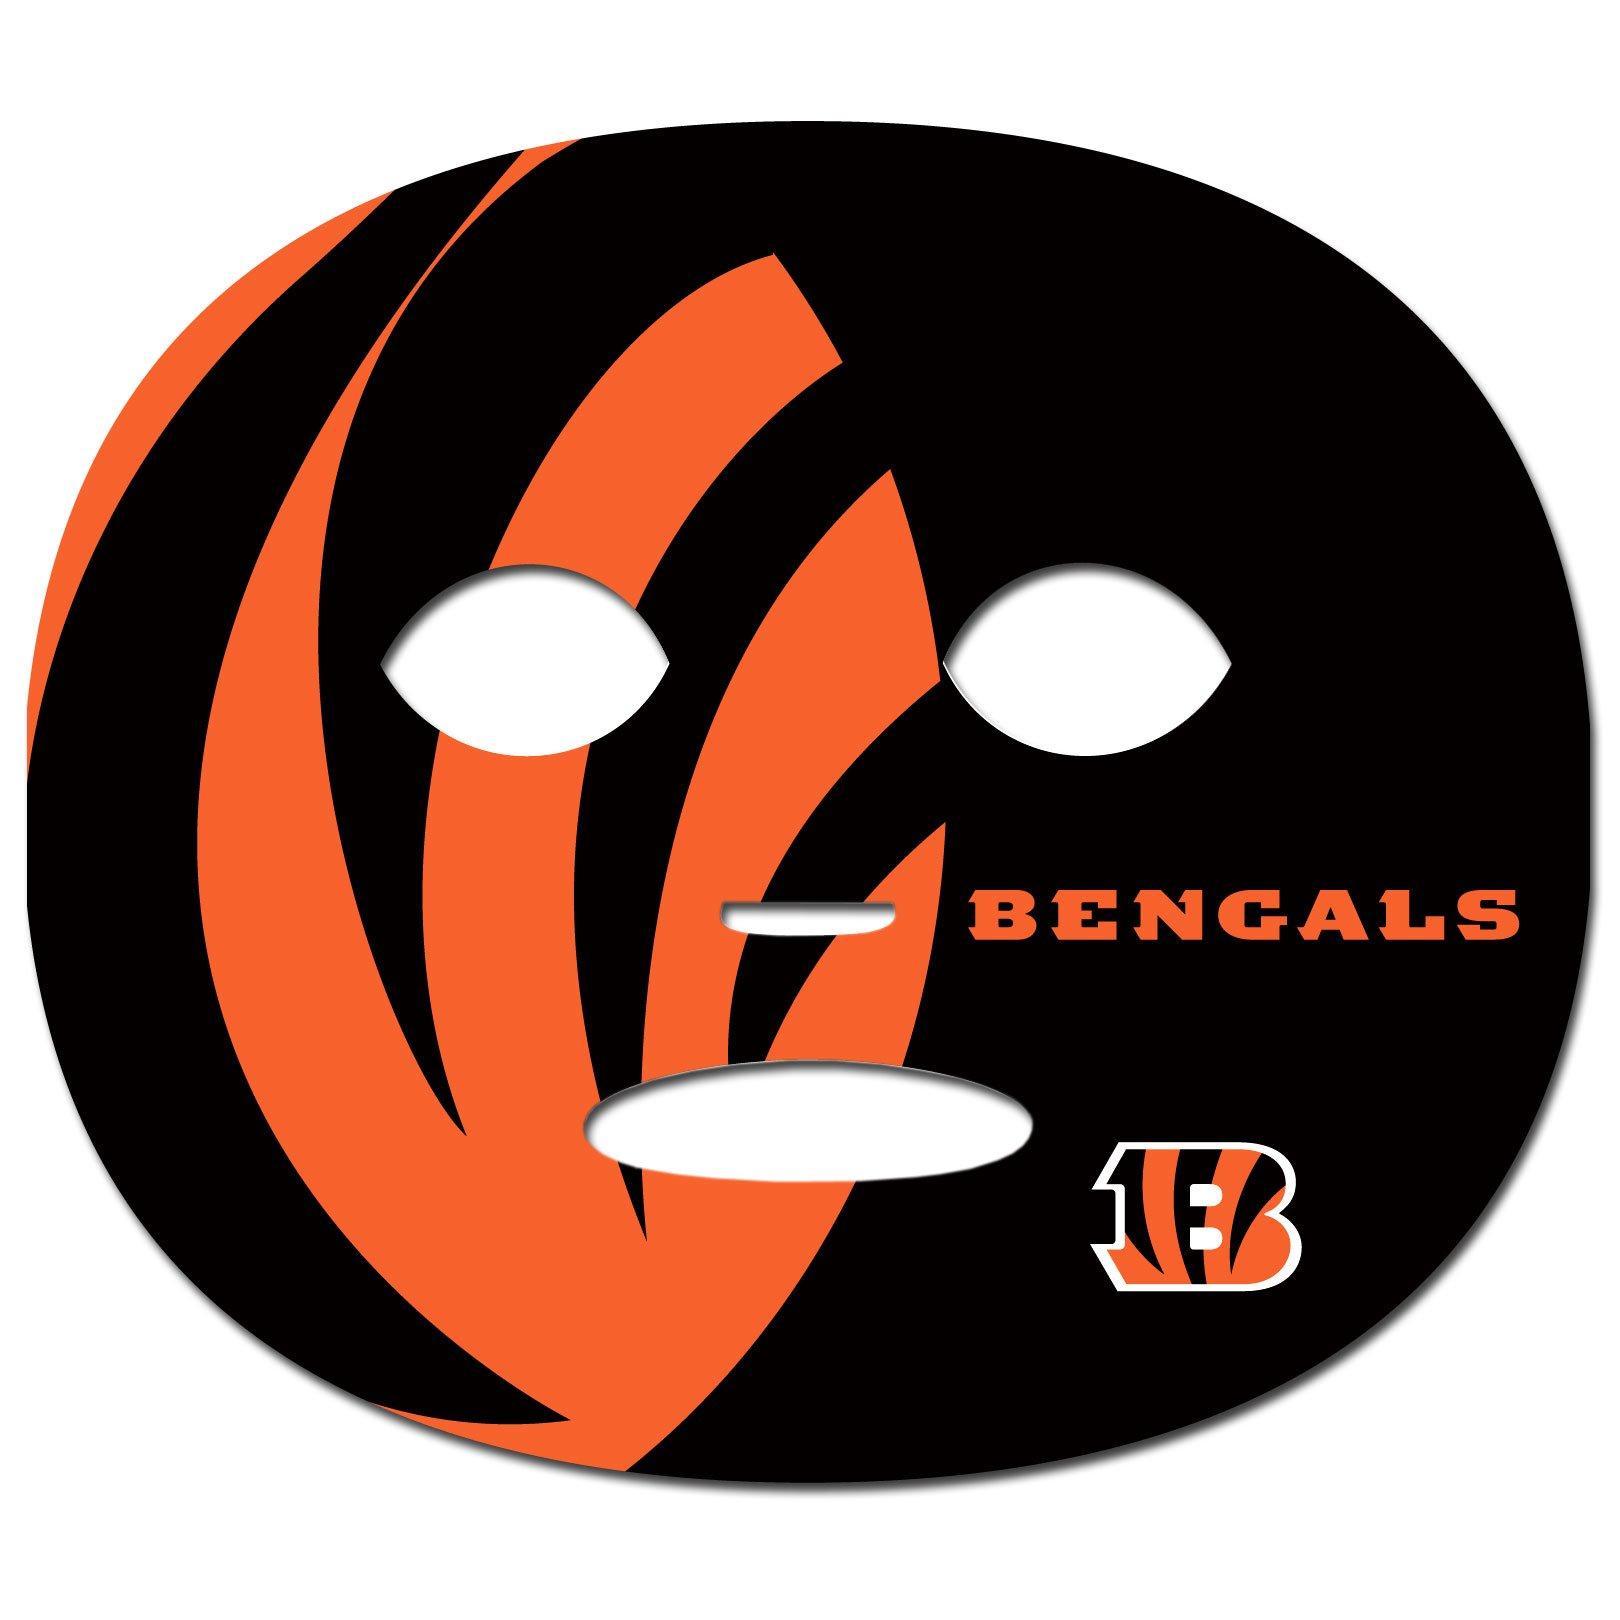 Siskiyou NFL Cincinnati Bengals Game Day Face Temporary Tattoo